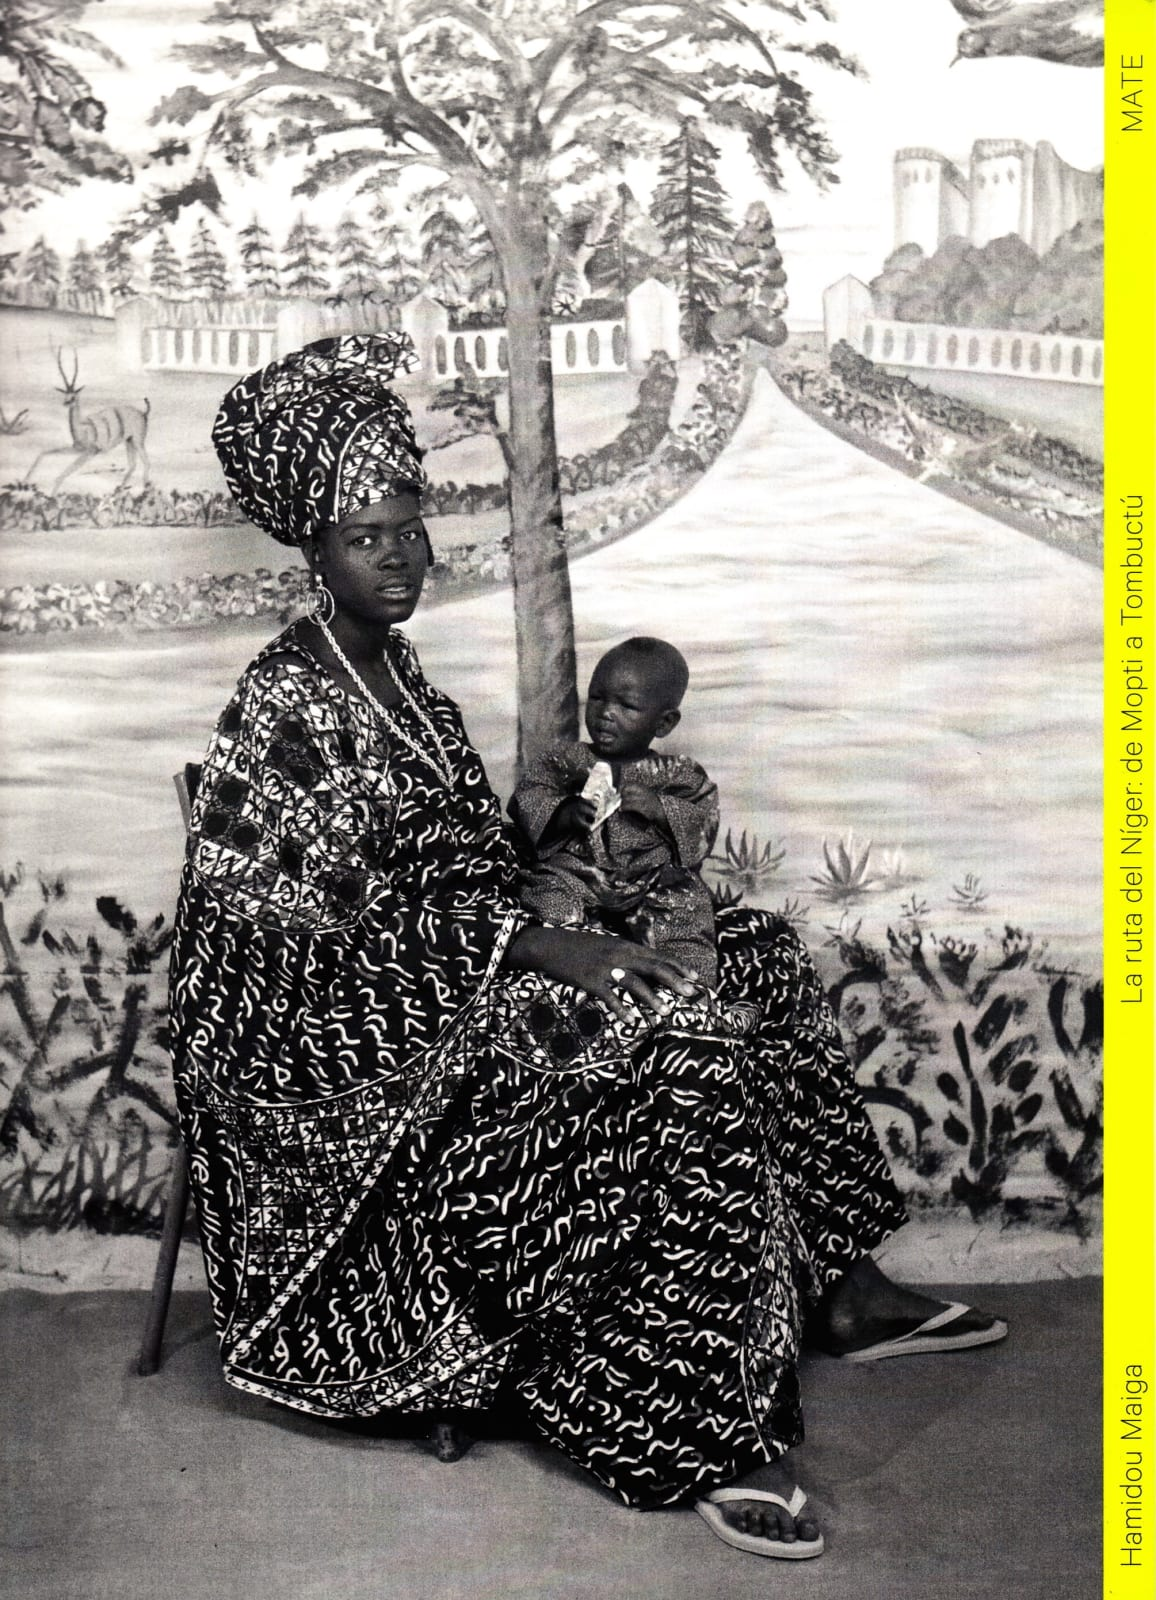 Hamidou Maiga, 'La ruta del Niger: de Mopti a Tomboctu' MATE: Museo Mario Testino, Lima, Peru